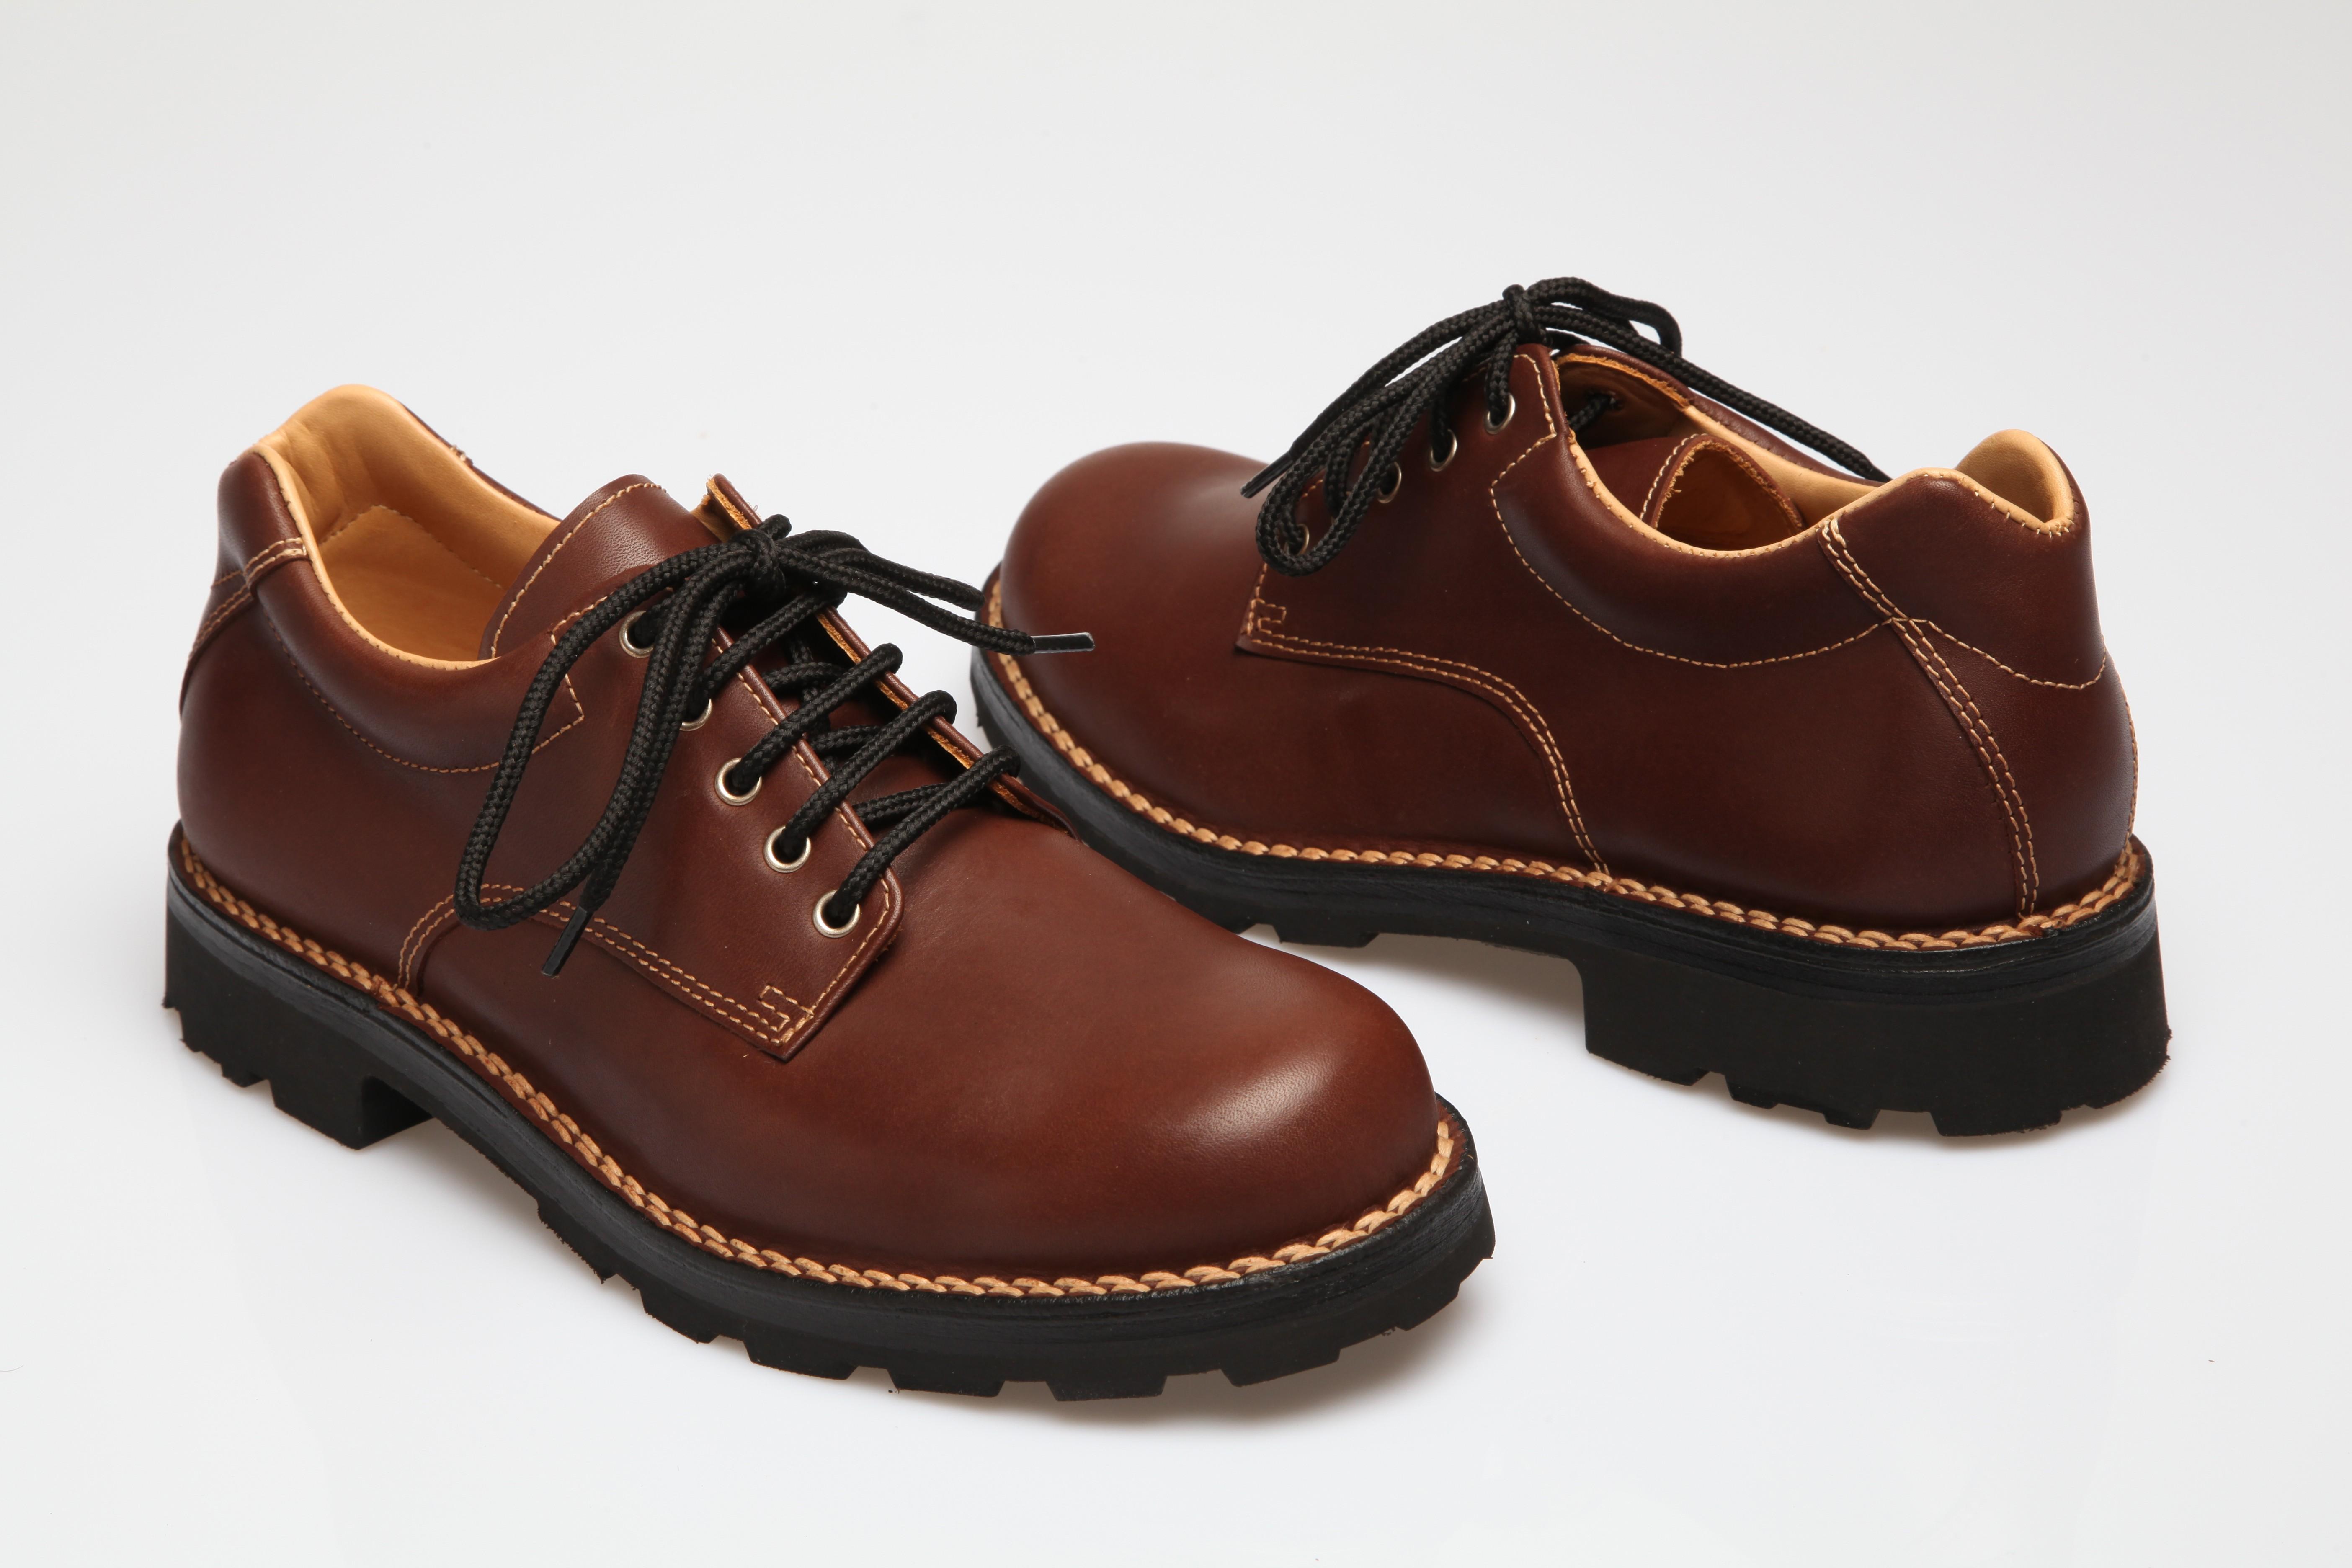 Chaussure besson - Besson chaussures cholet ...